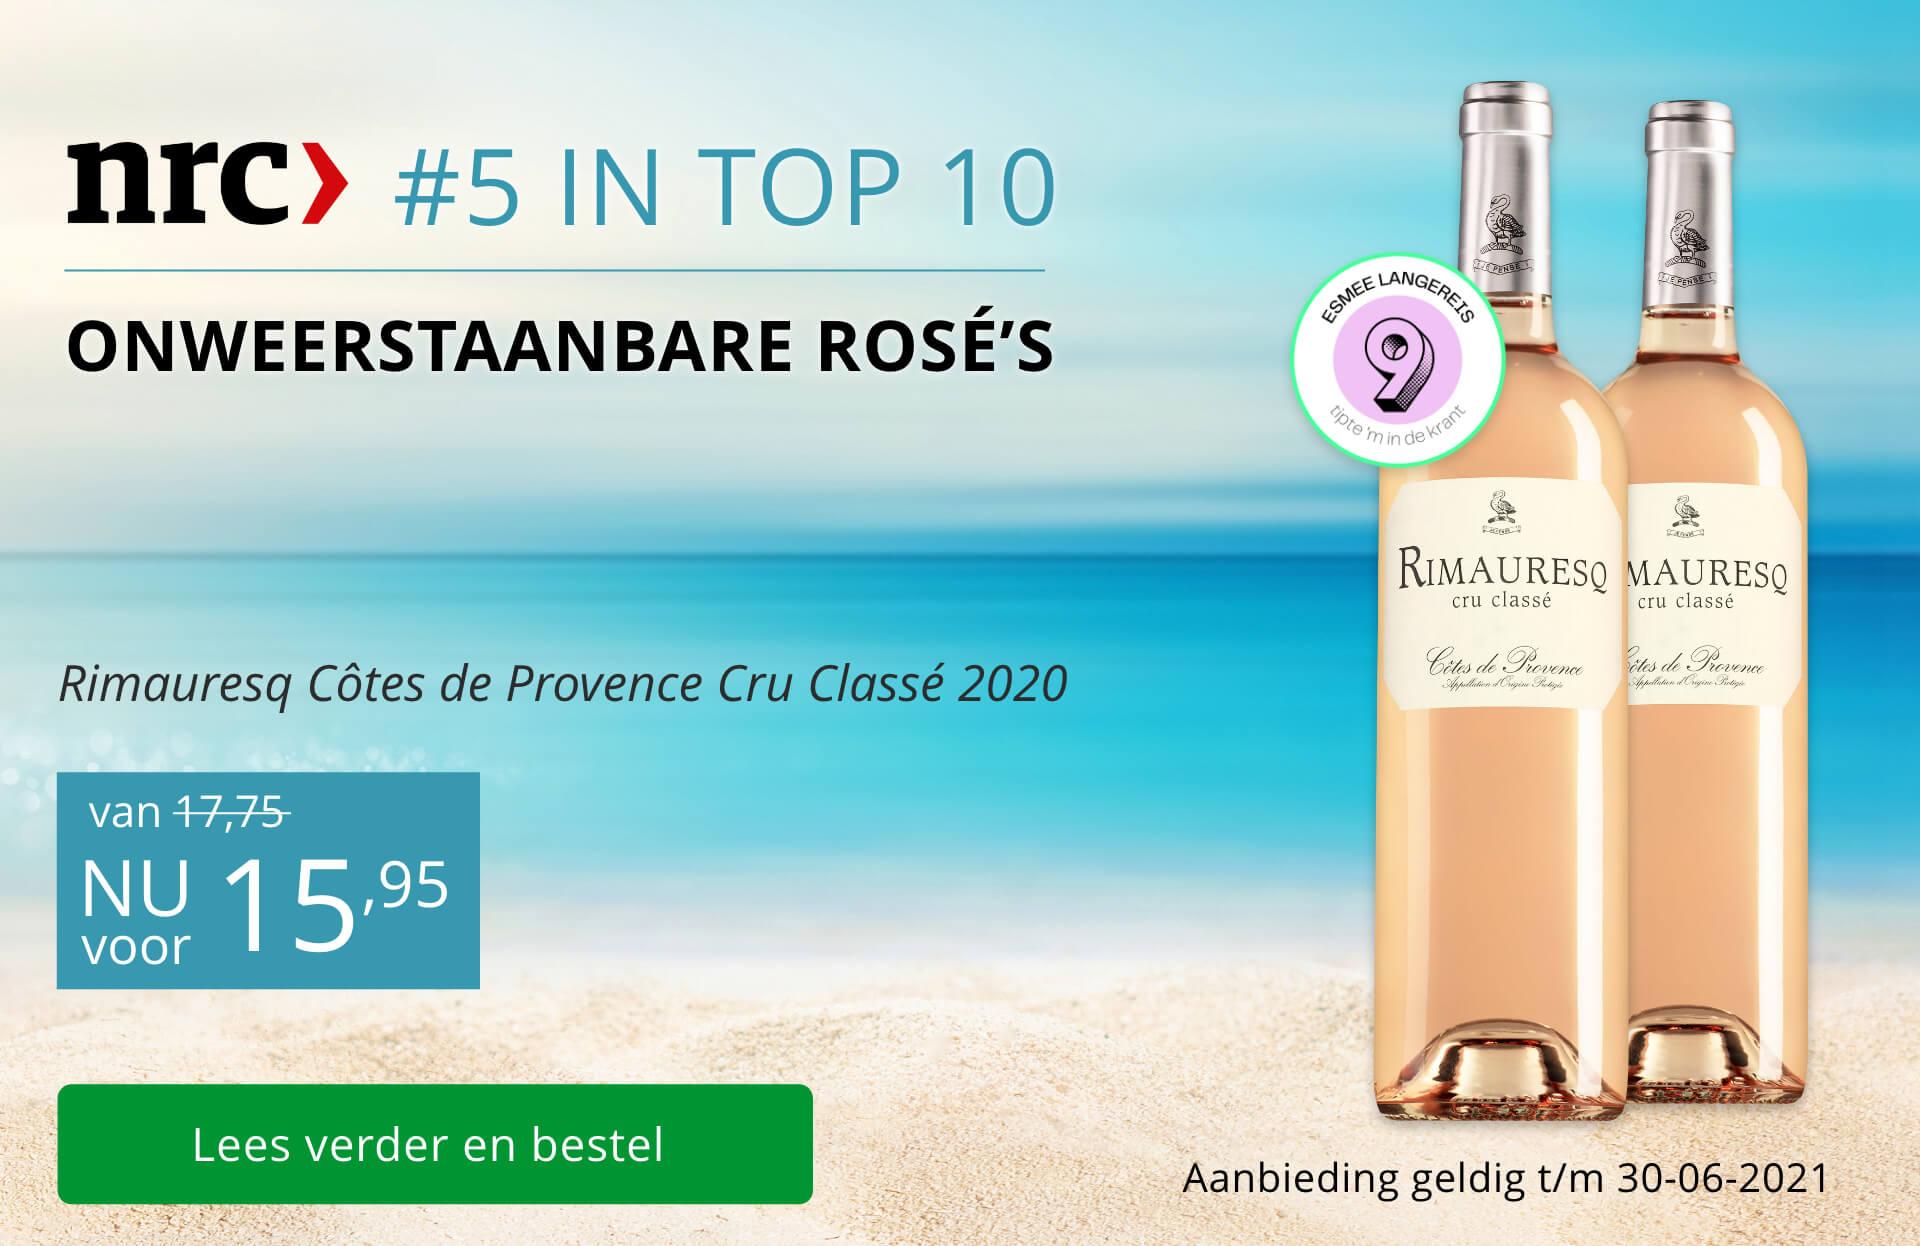 NRC - Domaine de Rimauresq Côtes de Provence Cru Classé Rosé 2020